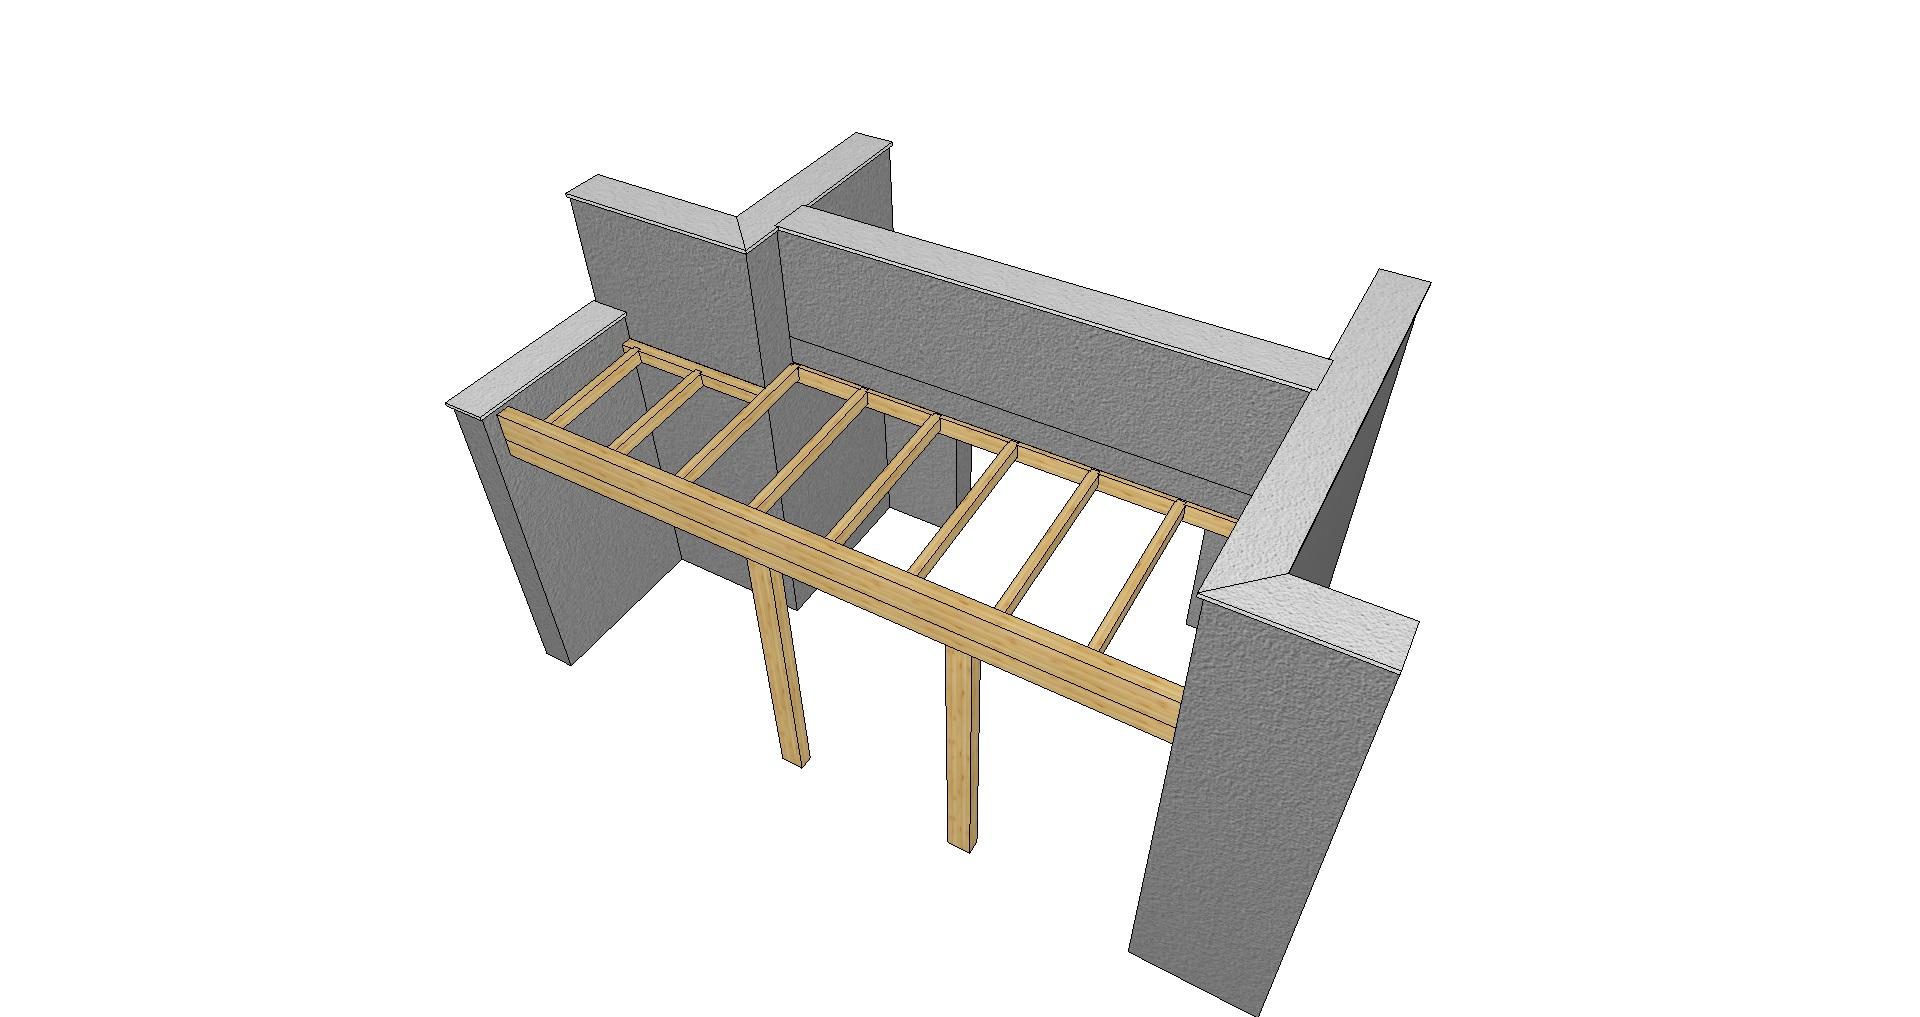 Structural_Design_A004